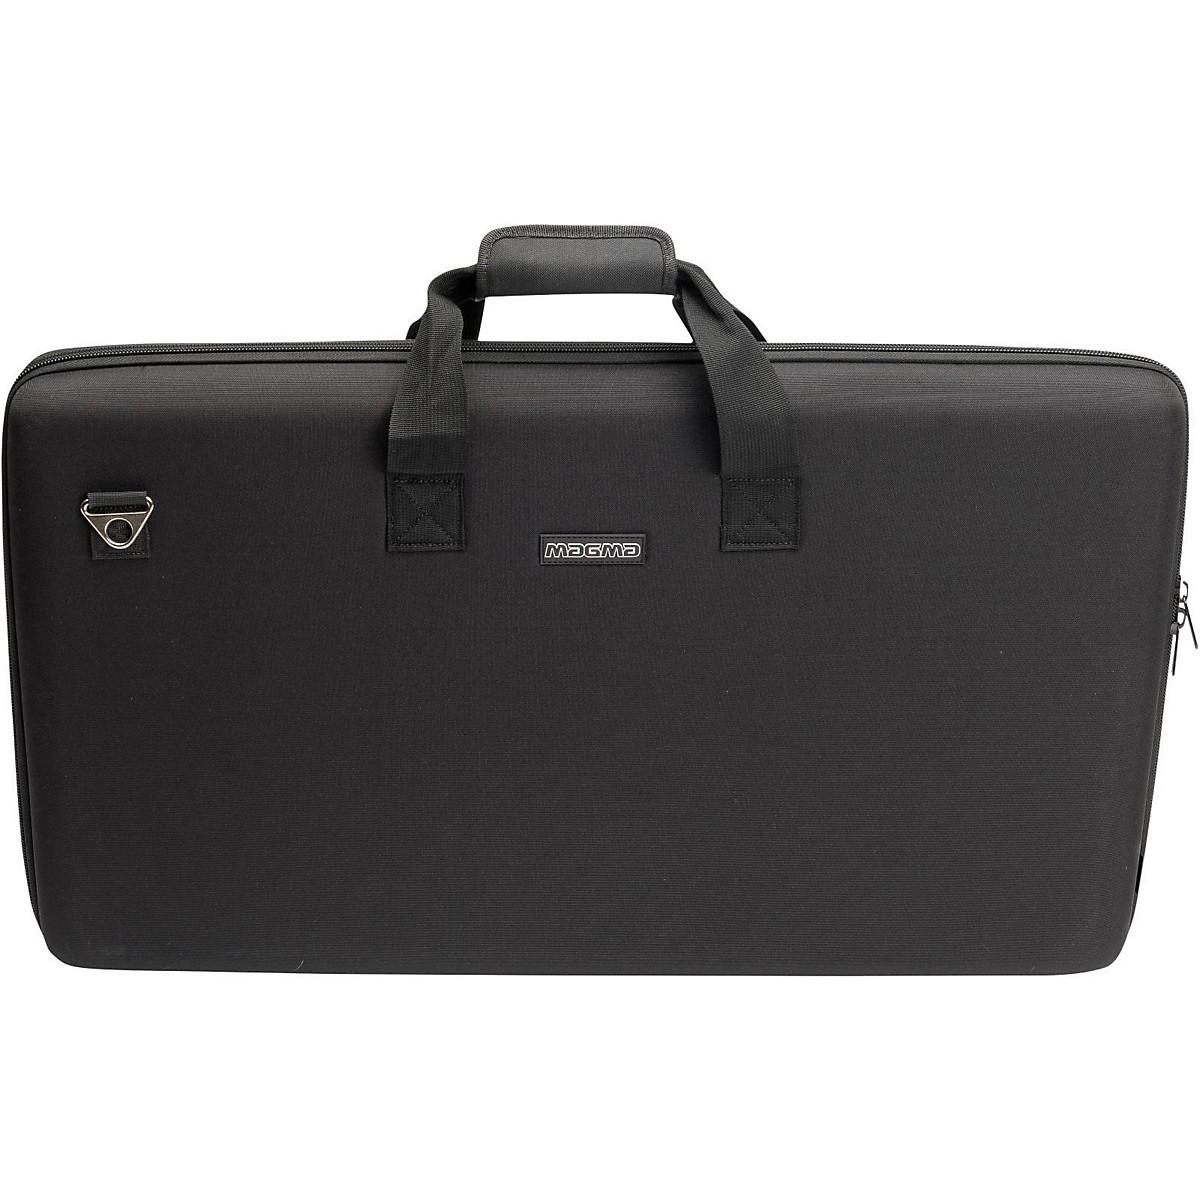 Magma Cases CTRL Case SX2/RX